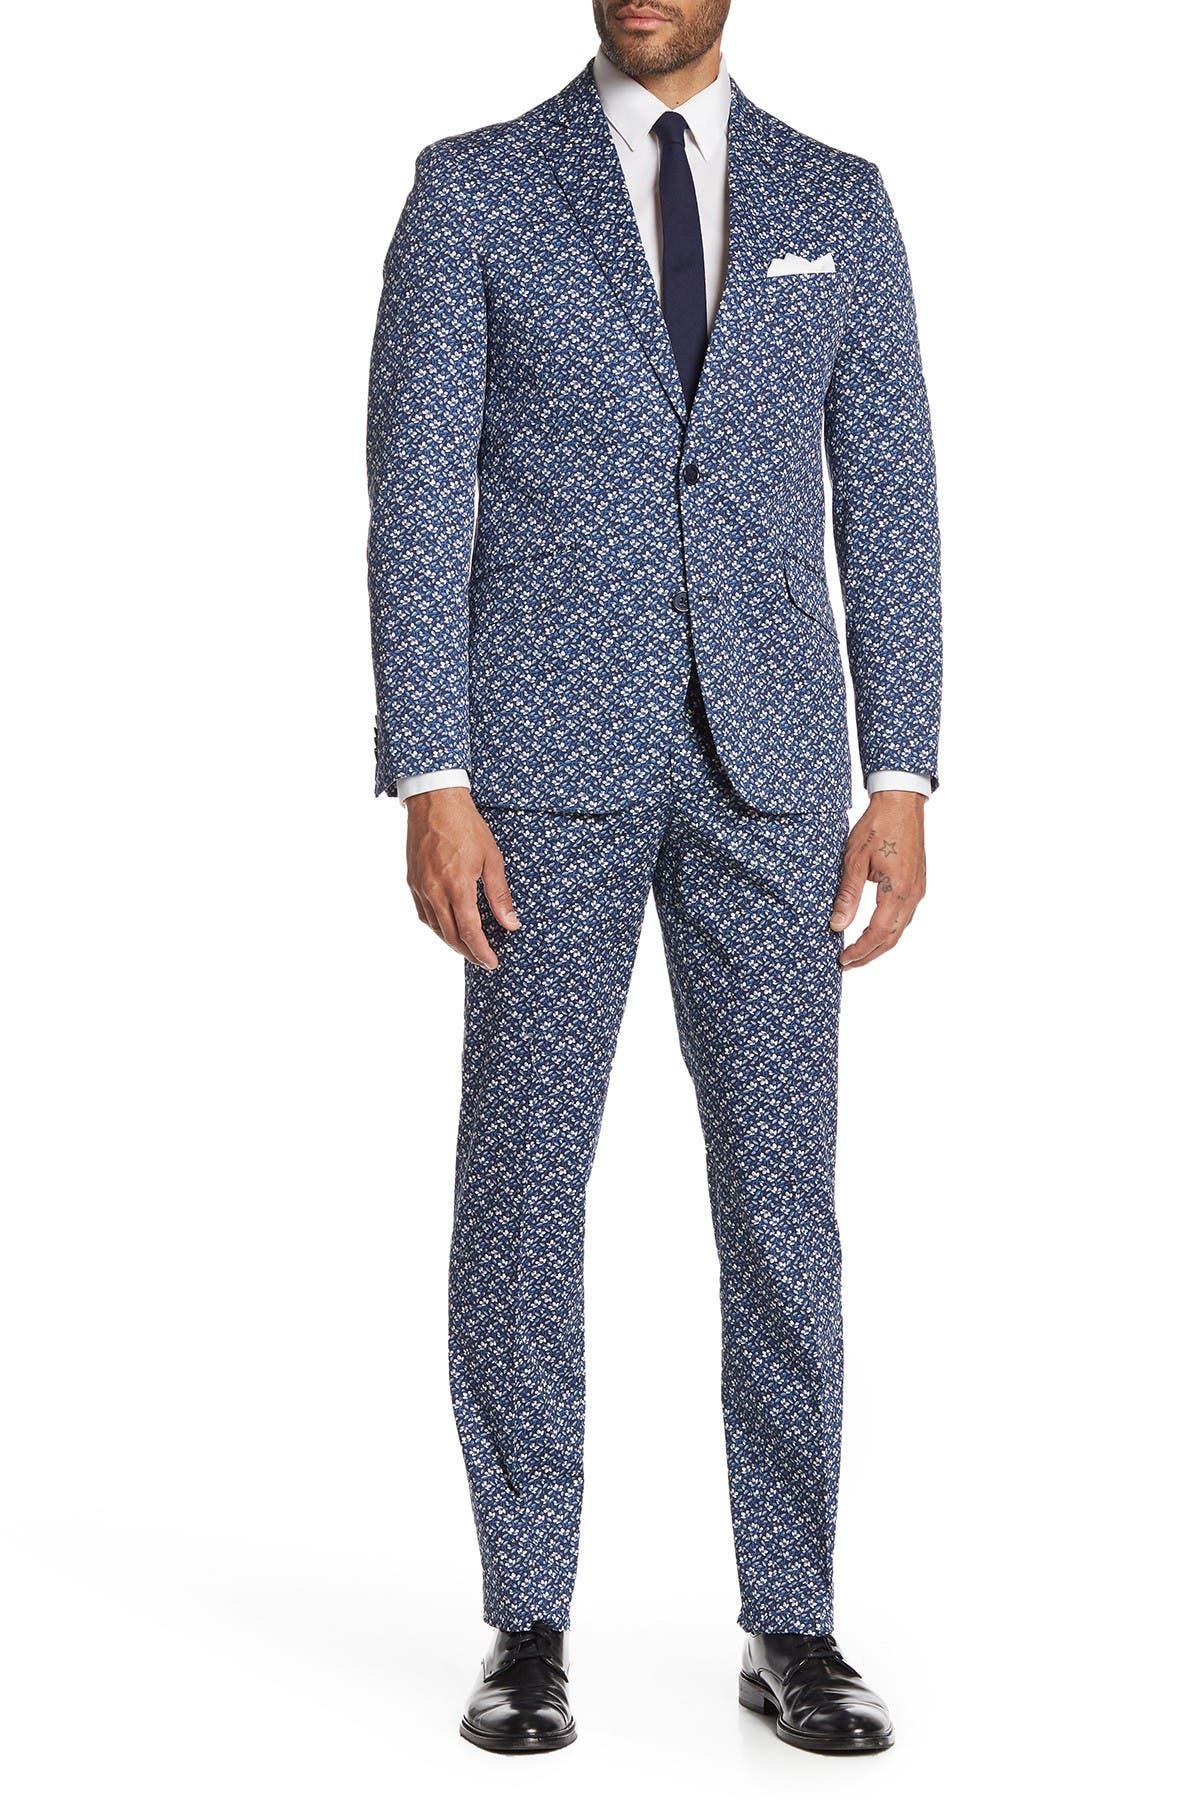 Image of SAVILE ROW CO Hoxton Navy Blue Floral Two Button Notch Lapel Slim Fit Suit